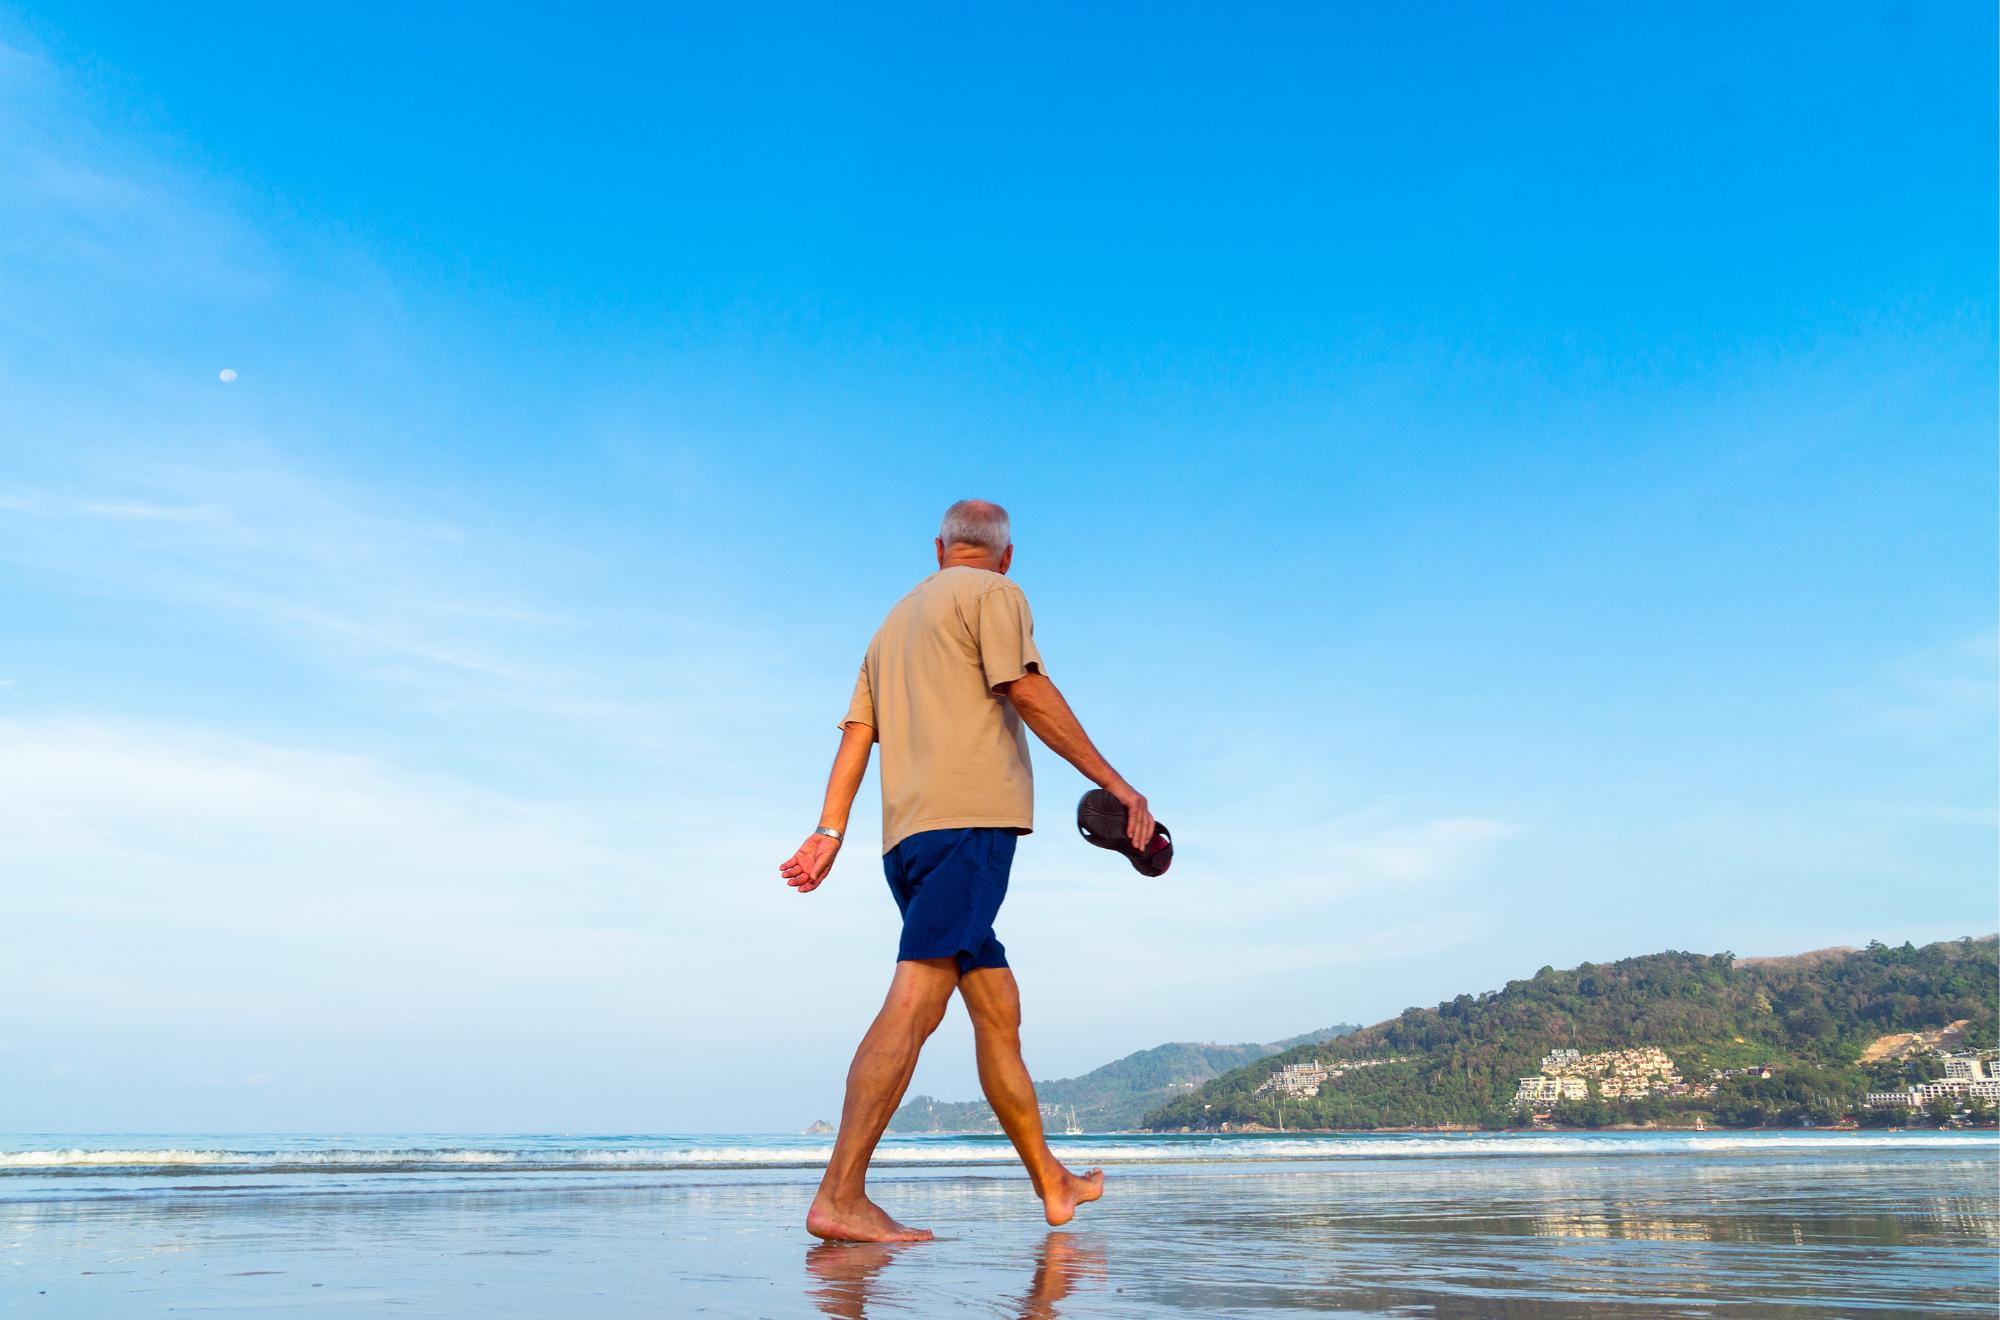 Saving for Retirement When Single